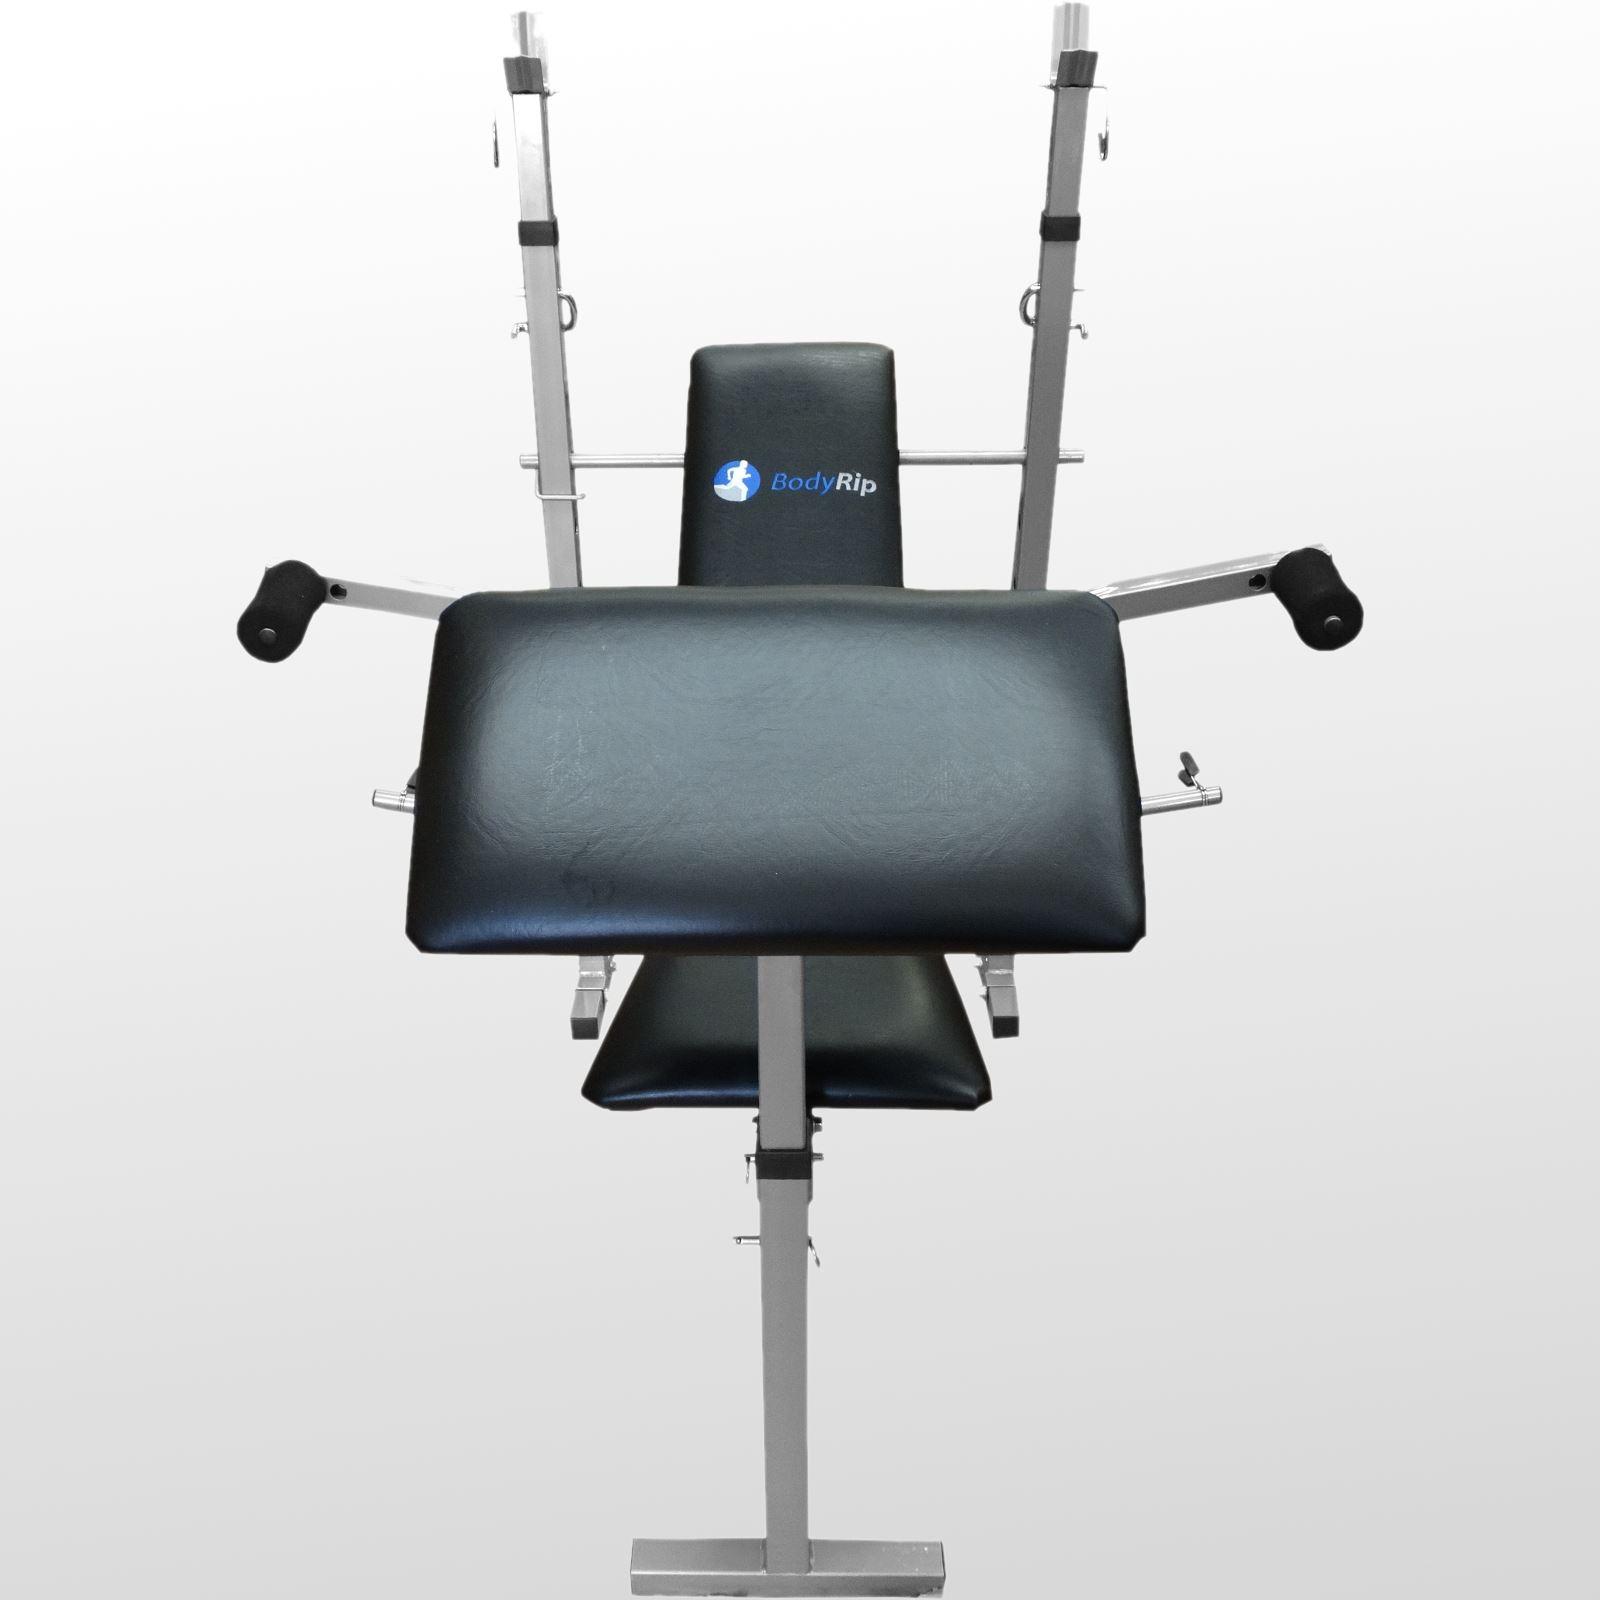 Bodyrip Folding Weight Bench Gym Exercise Lifting Chest Press Leg Fitness Ebay